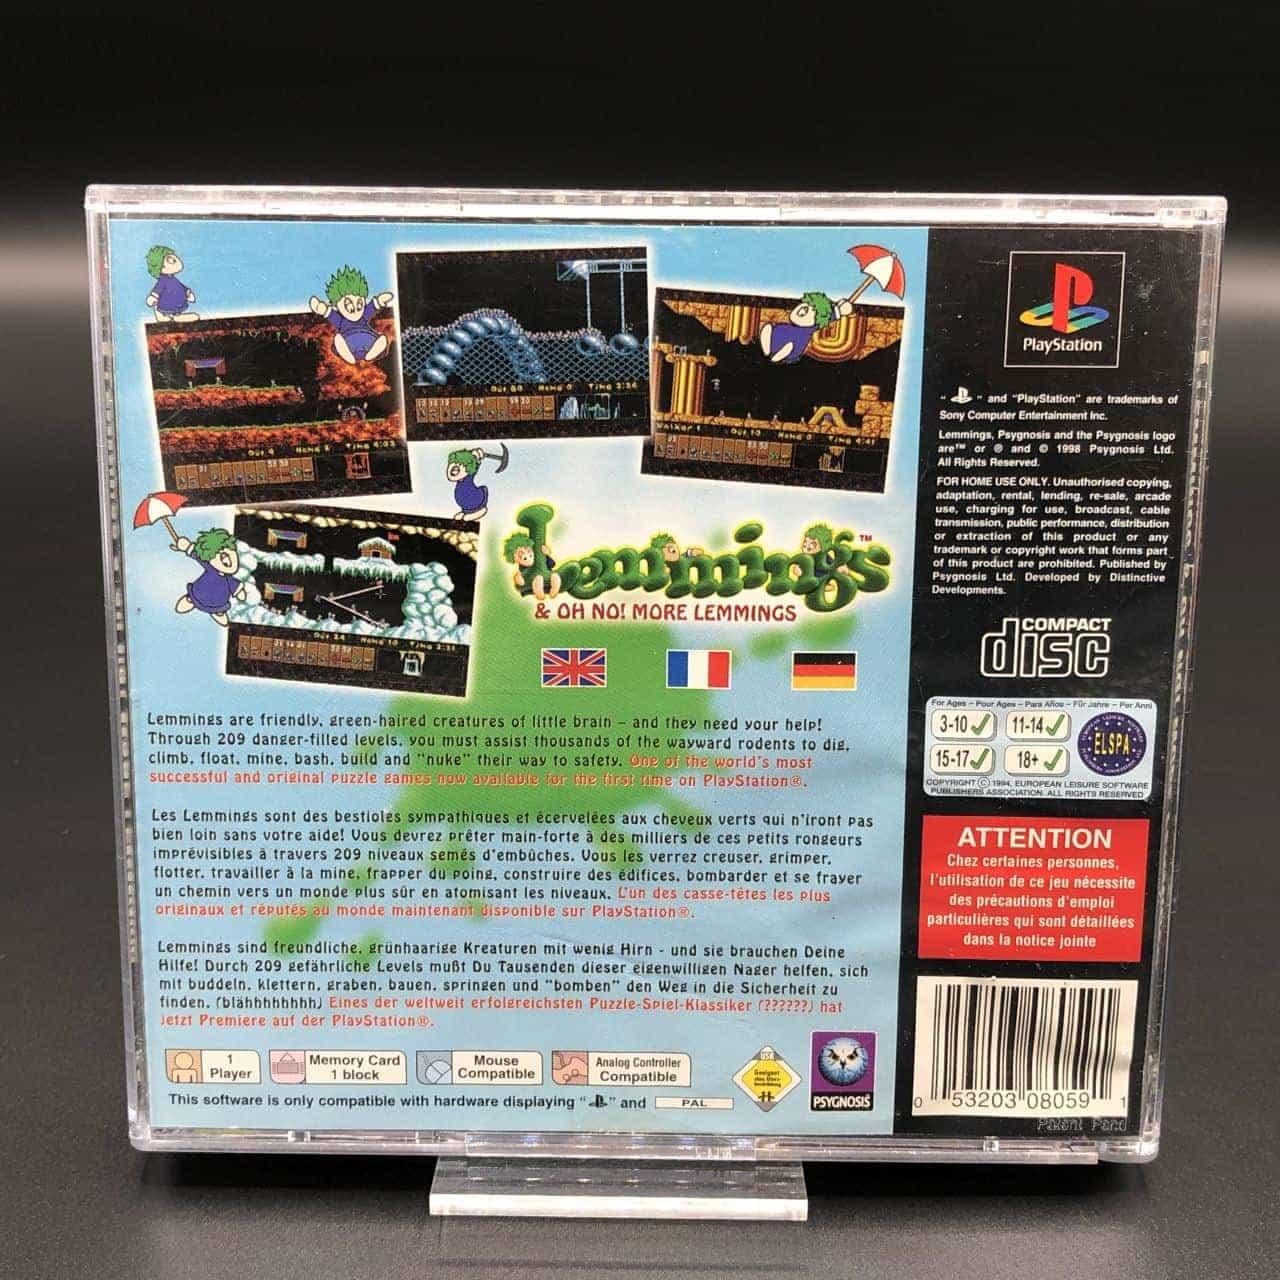 PS1 Lemmings: Oh no! More Lemmings (Komplett) (Gut) Sony PlayStation 1